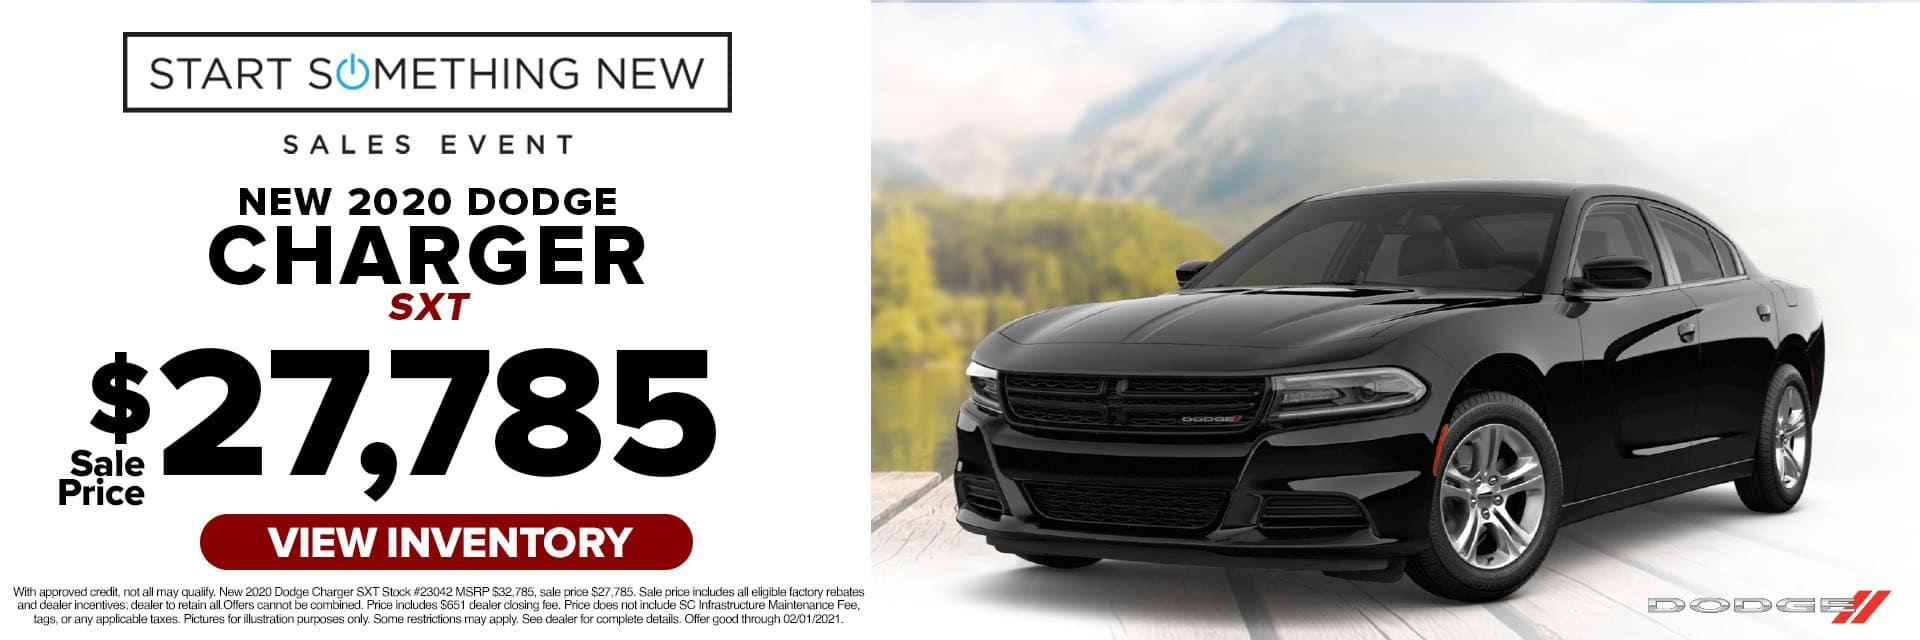 SLCJ-January 2021-2020 Dodge Charger